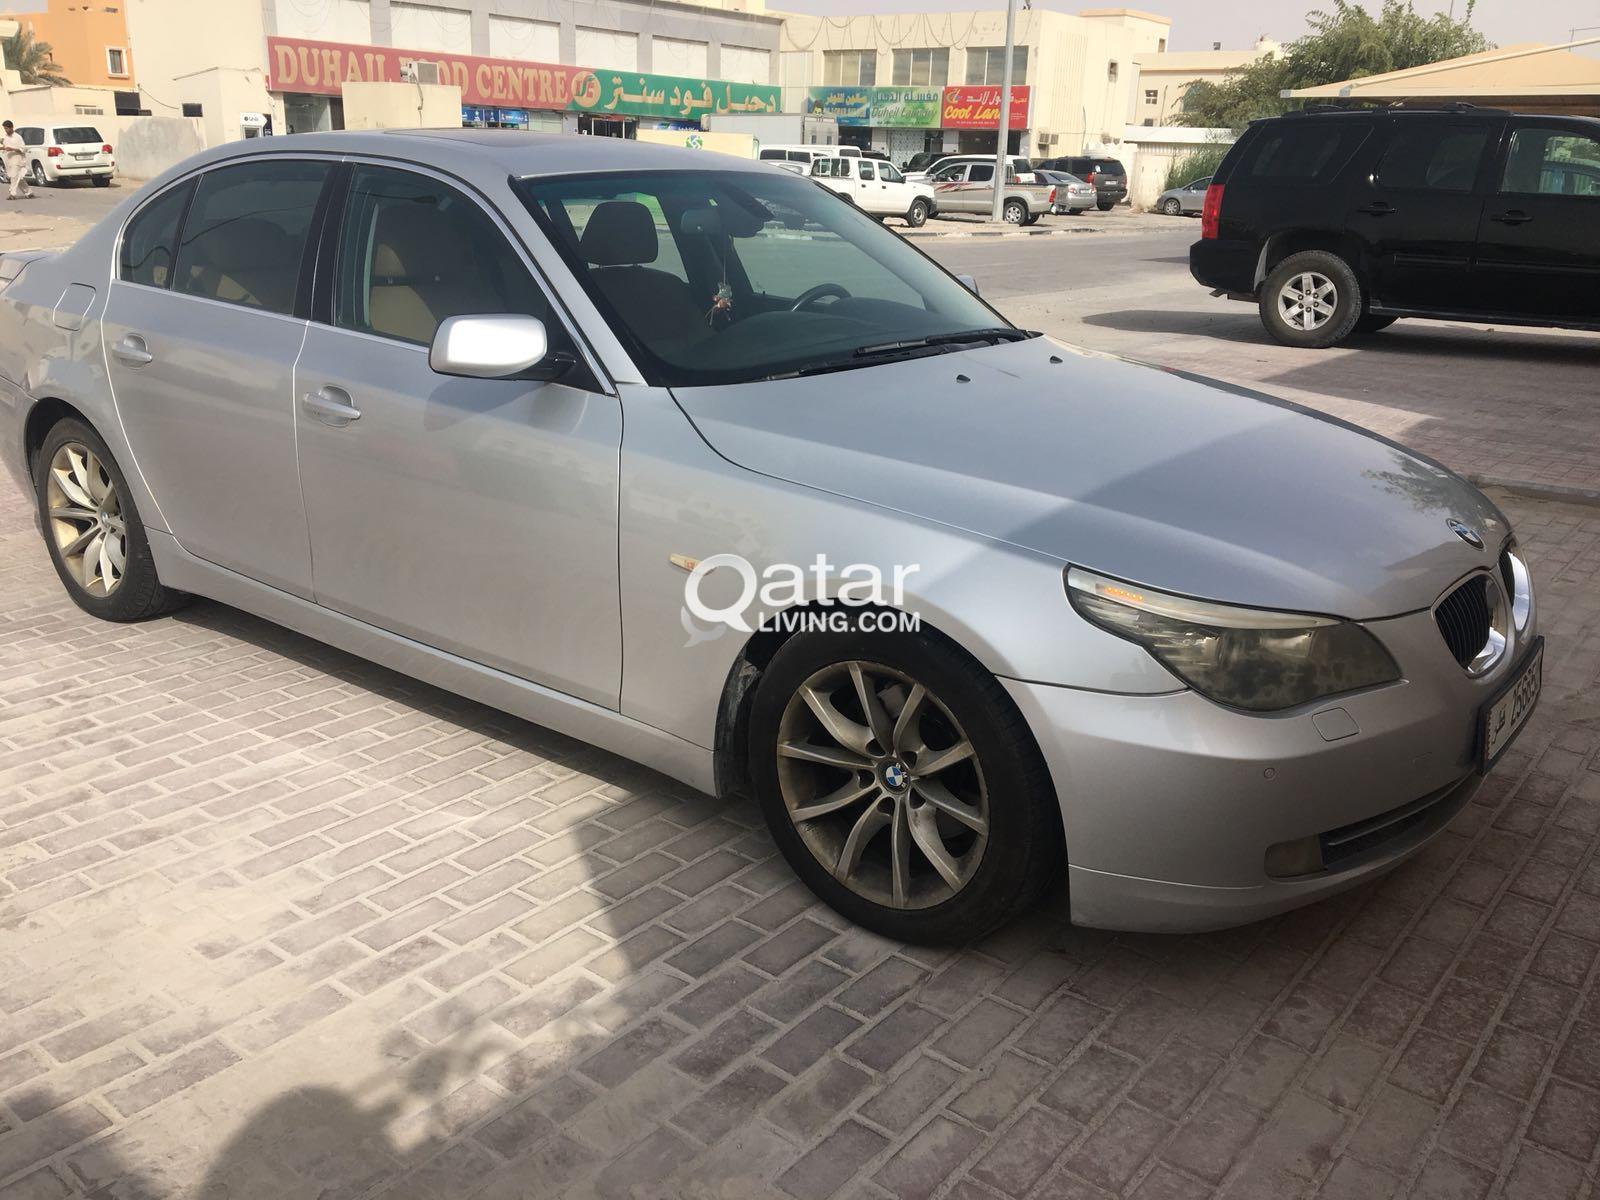 Bmw 525i Model For Sale Qatar Living